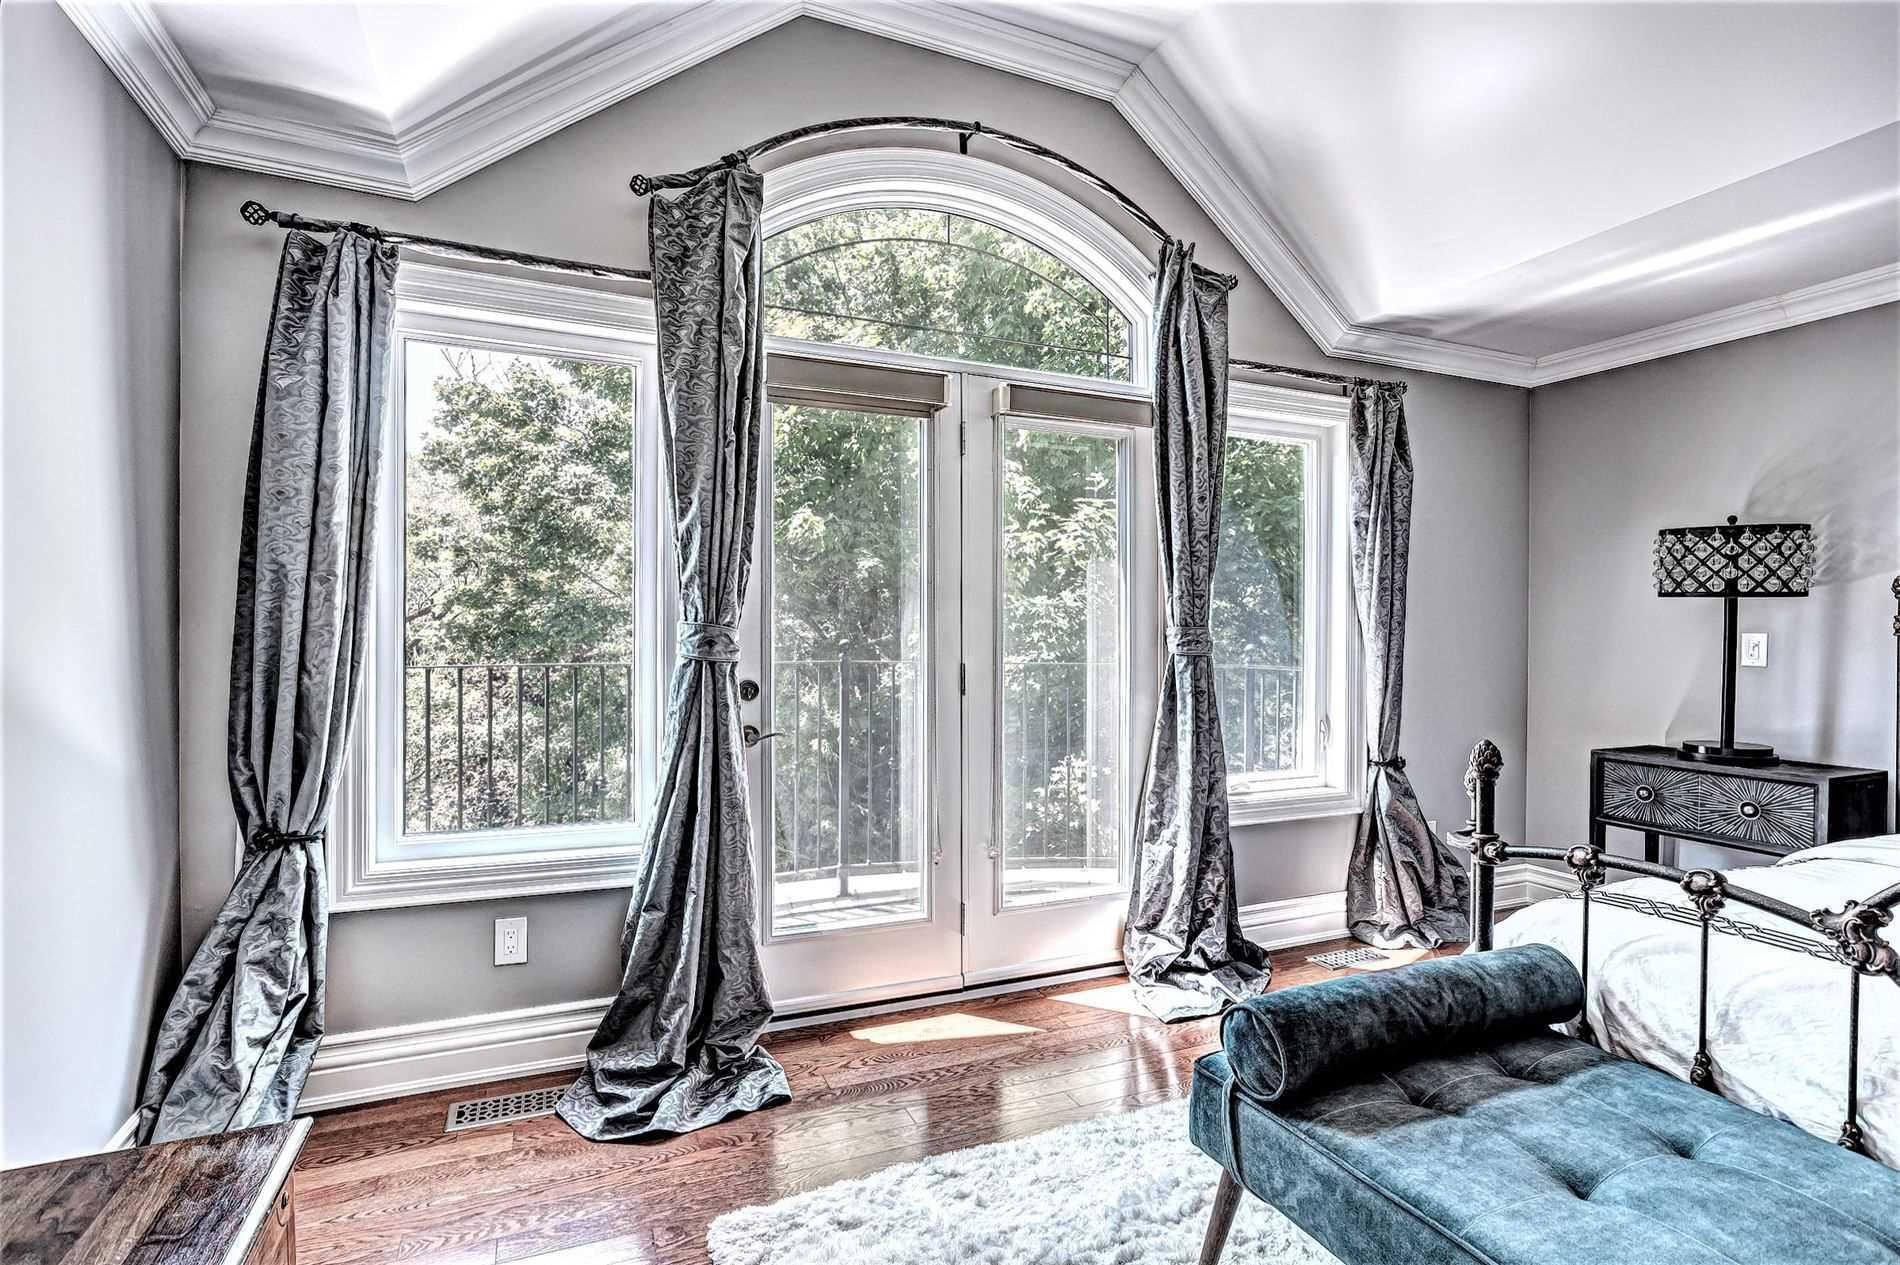 8 Leander Crt, Toronto, Ontario M432W1, 4 Bedrooms Bedrooms, 9 Rooms Rooms,5 BathroomsBathrooms,Detached,For Sale,Leander,E5272521